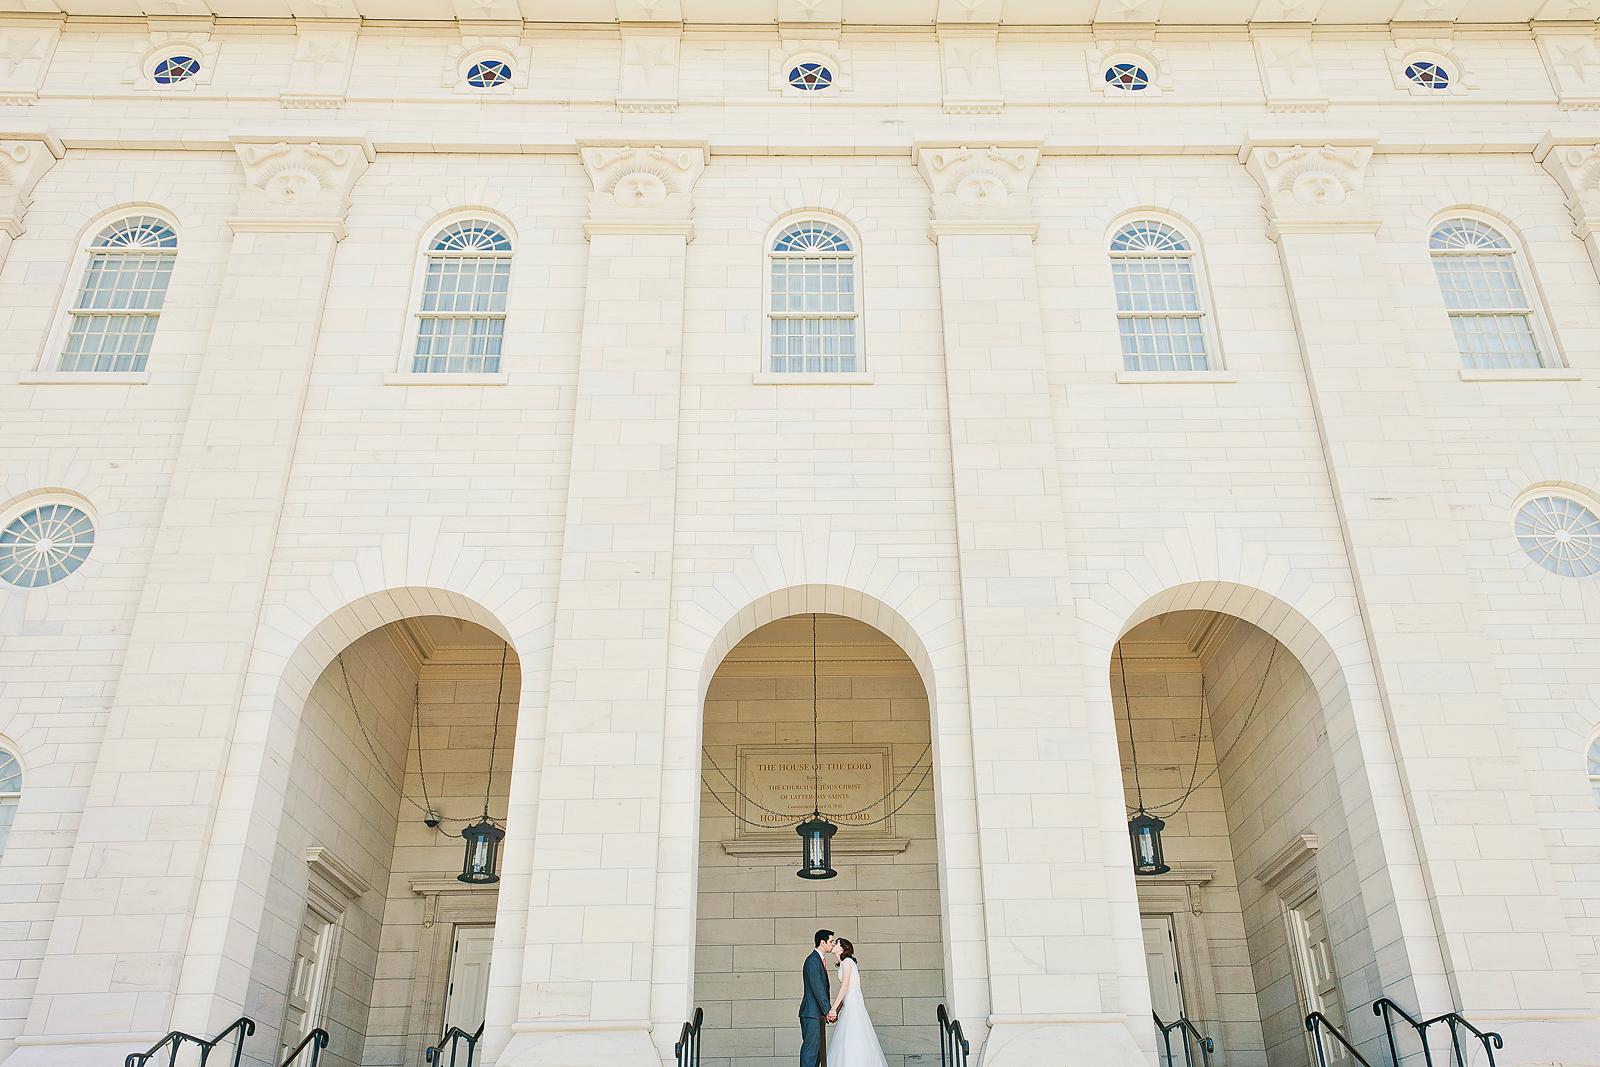 nauvoo_temple_wedding_014.jpg